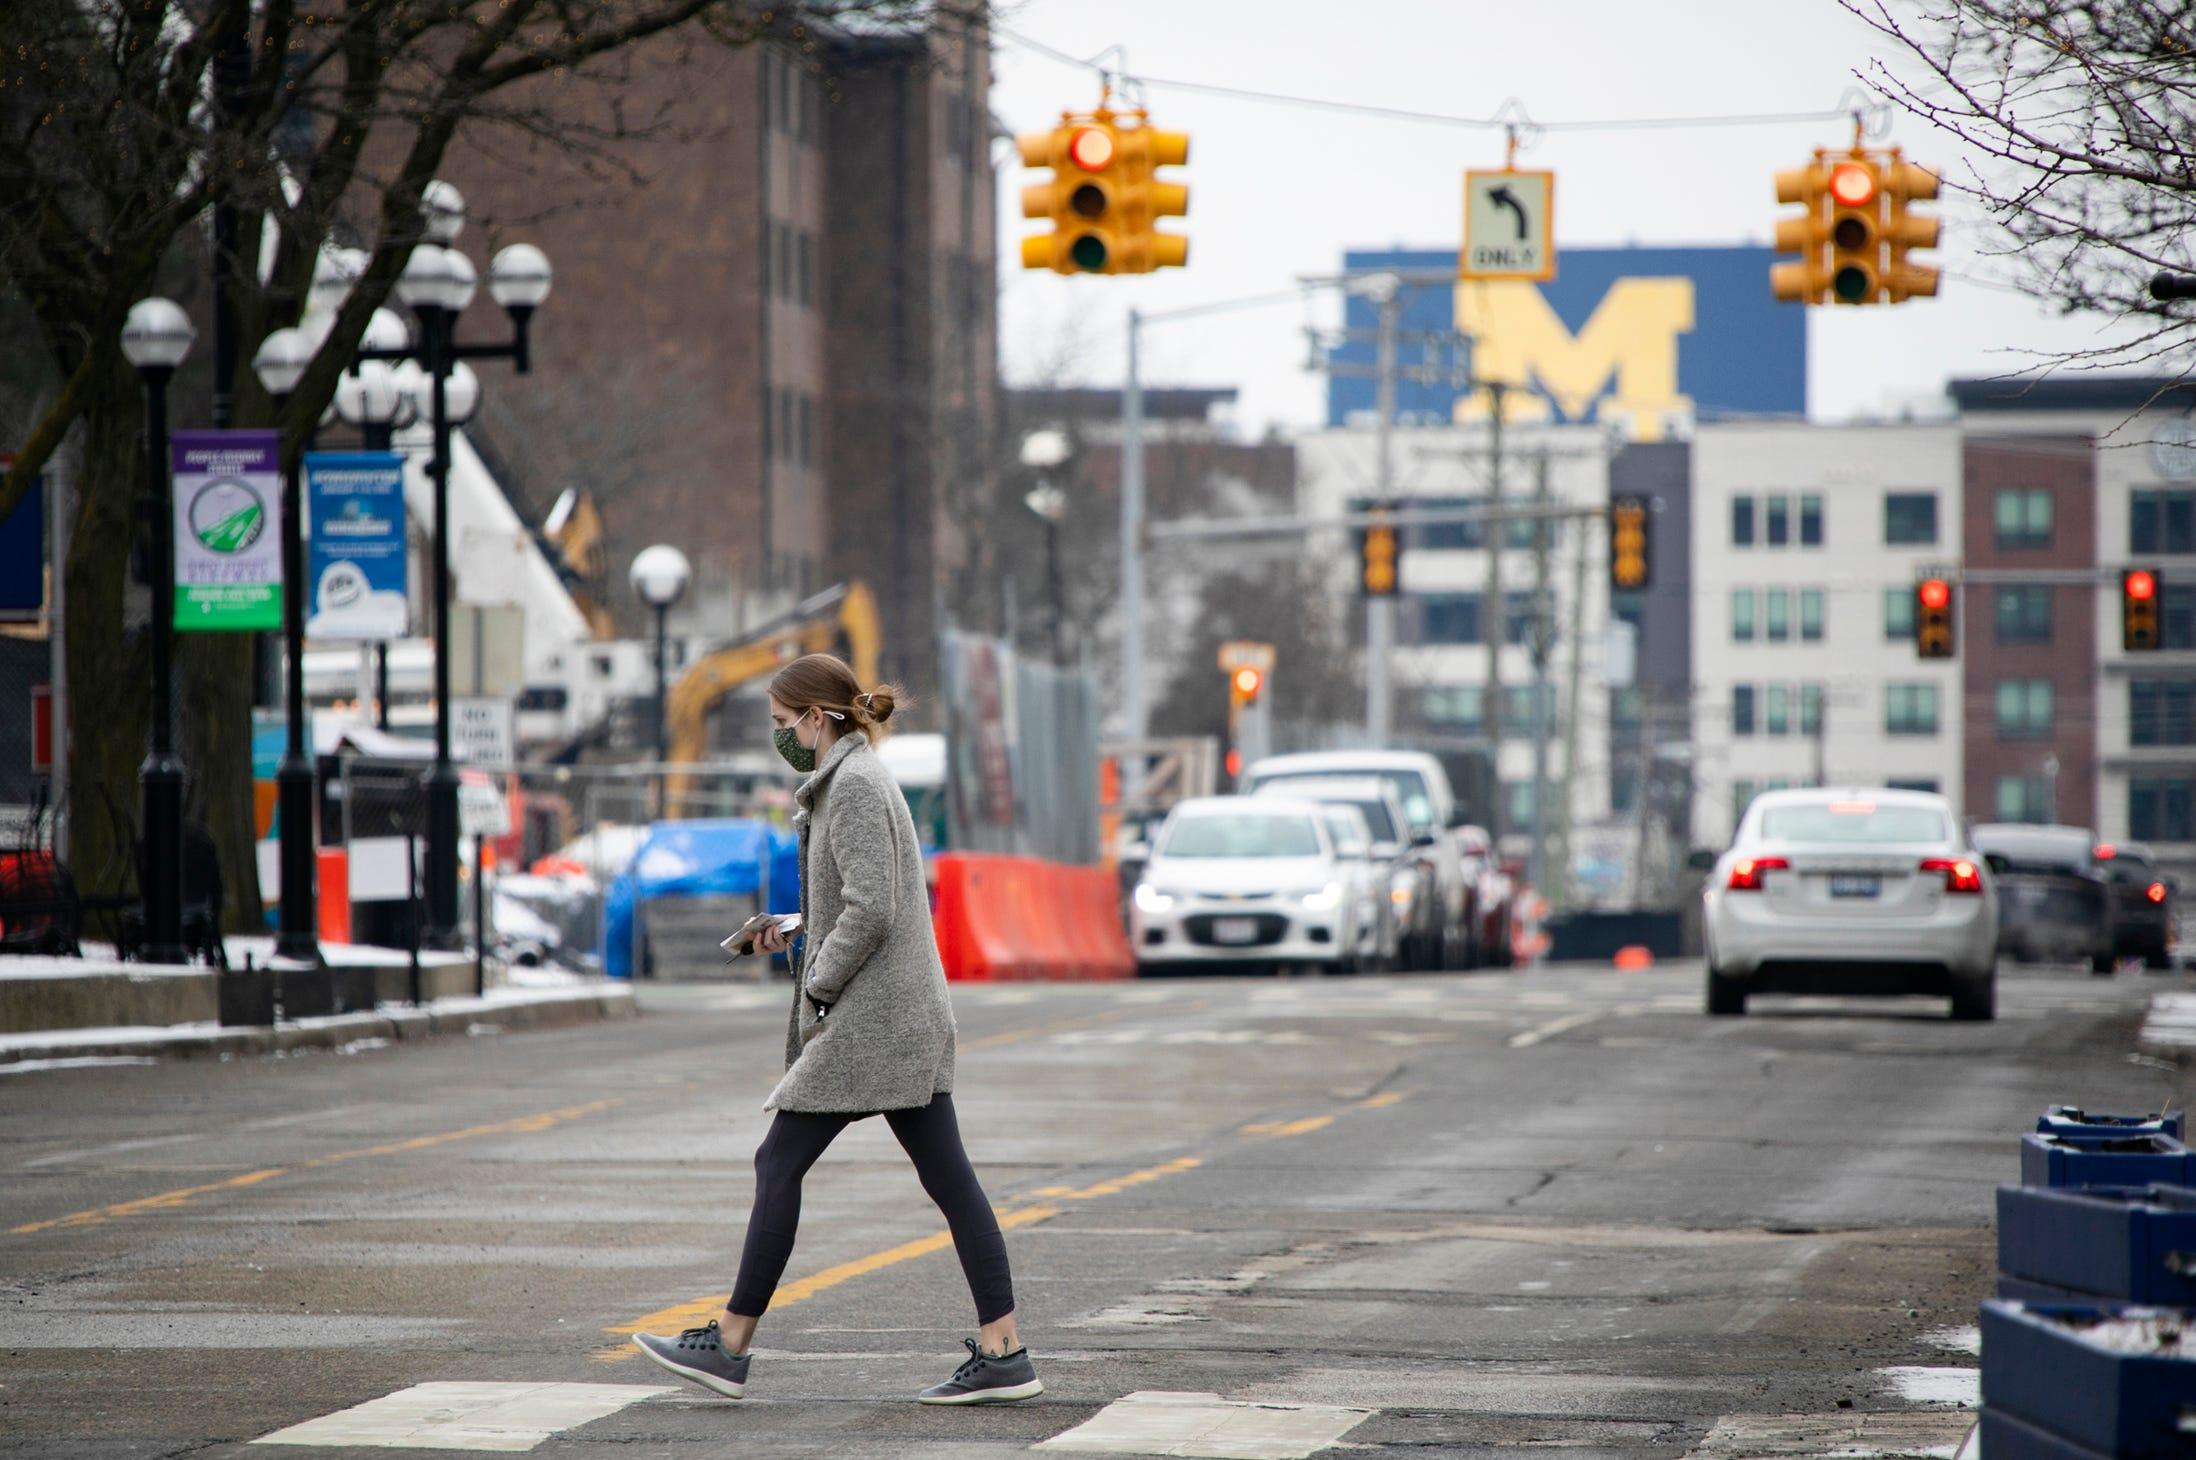 Rate of pedestrians killed last year hits gruesome milestone